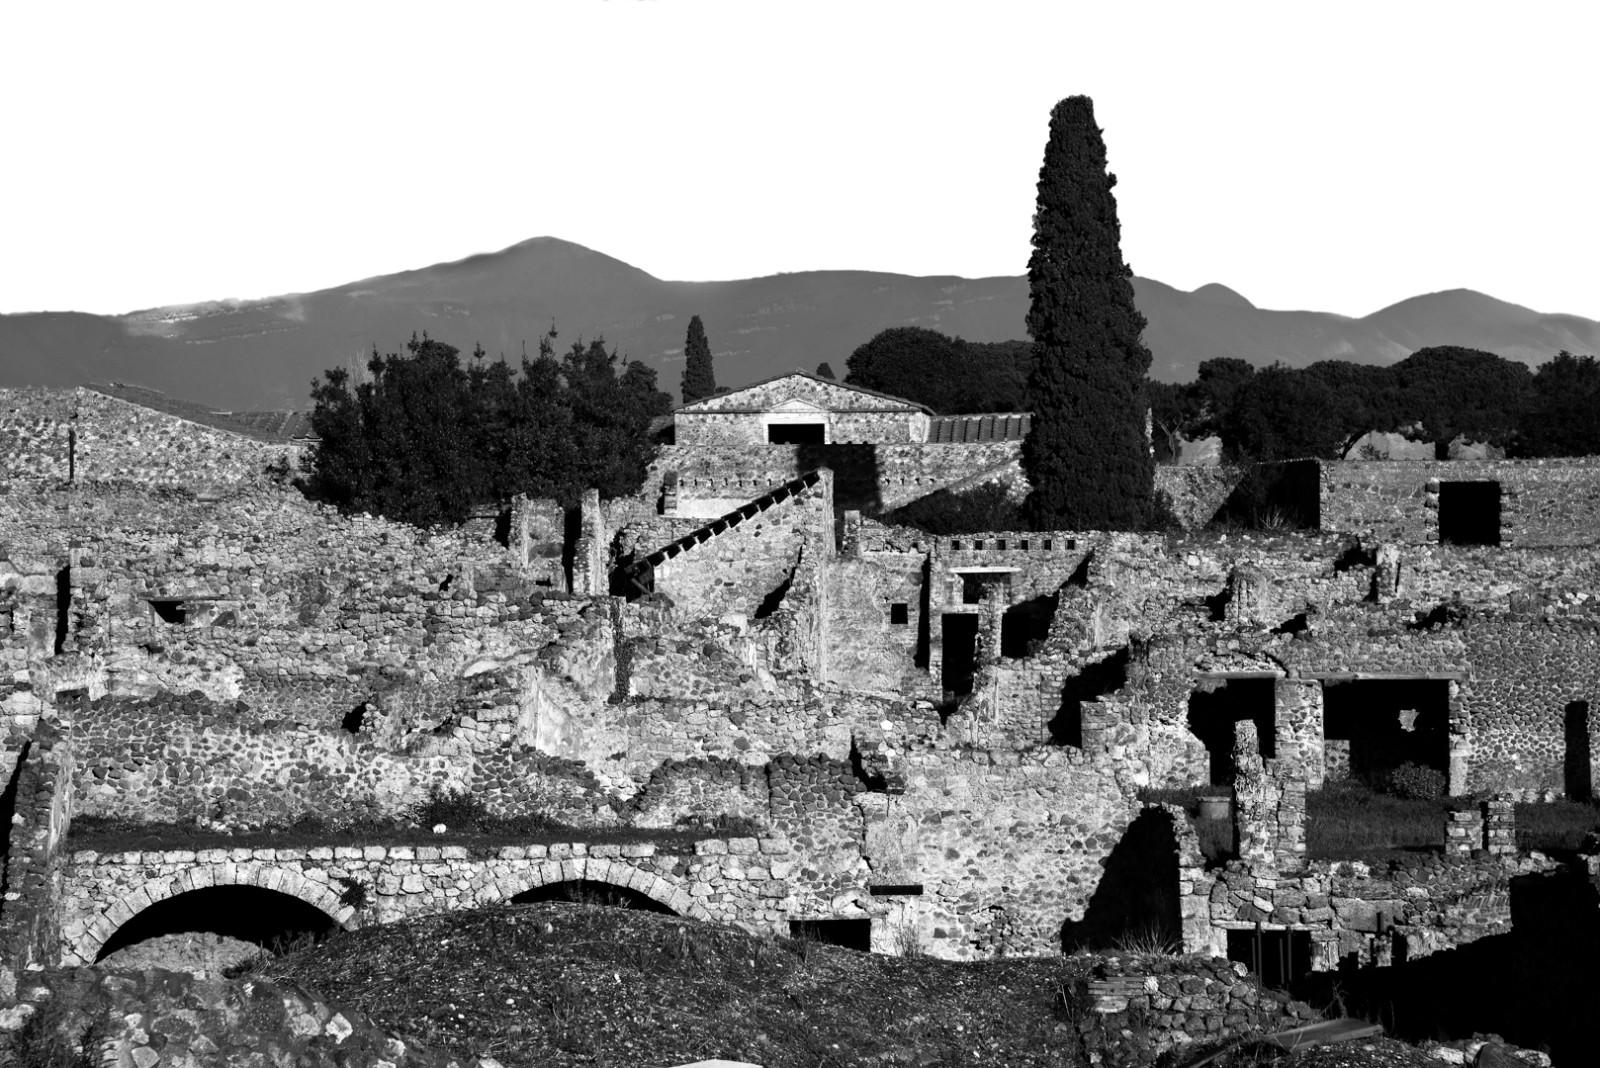 pompeii-13,xlarge.1507130091